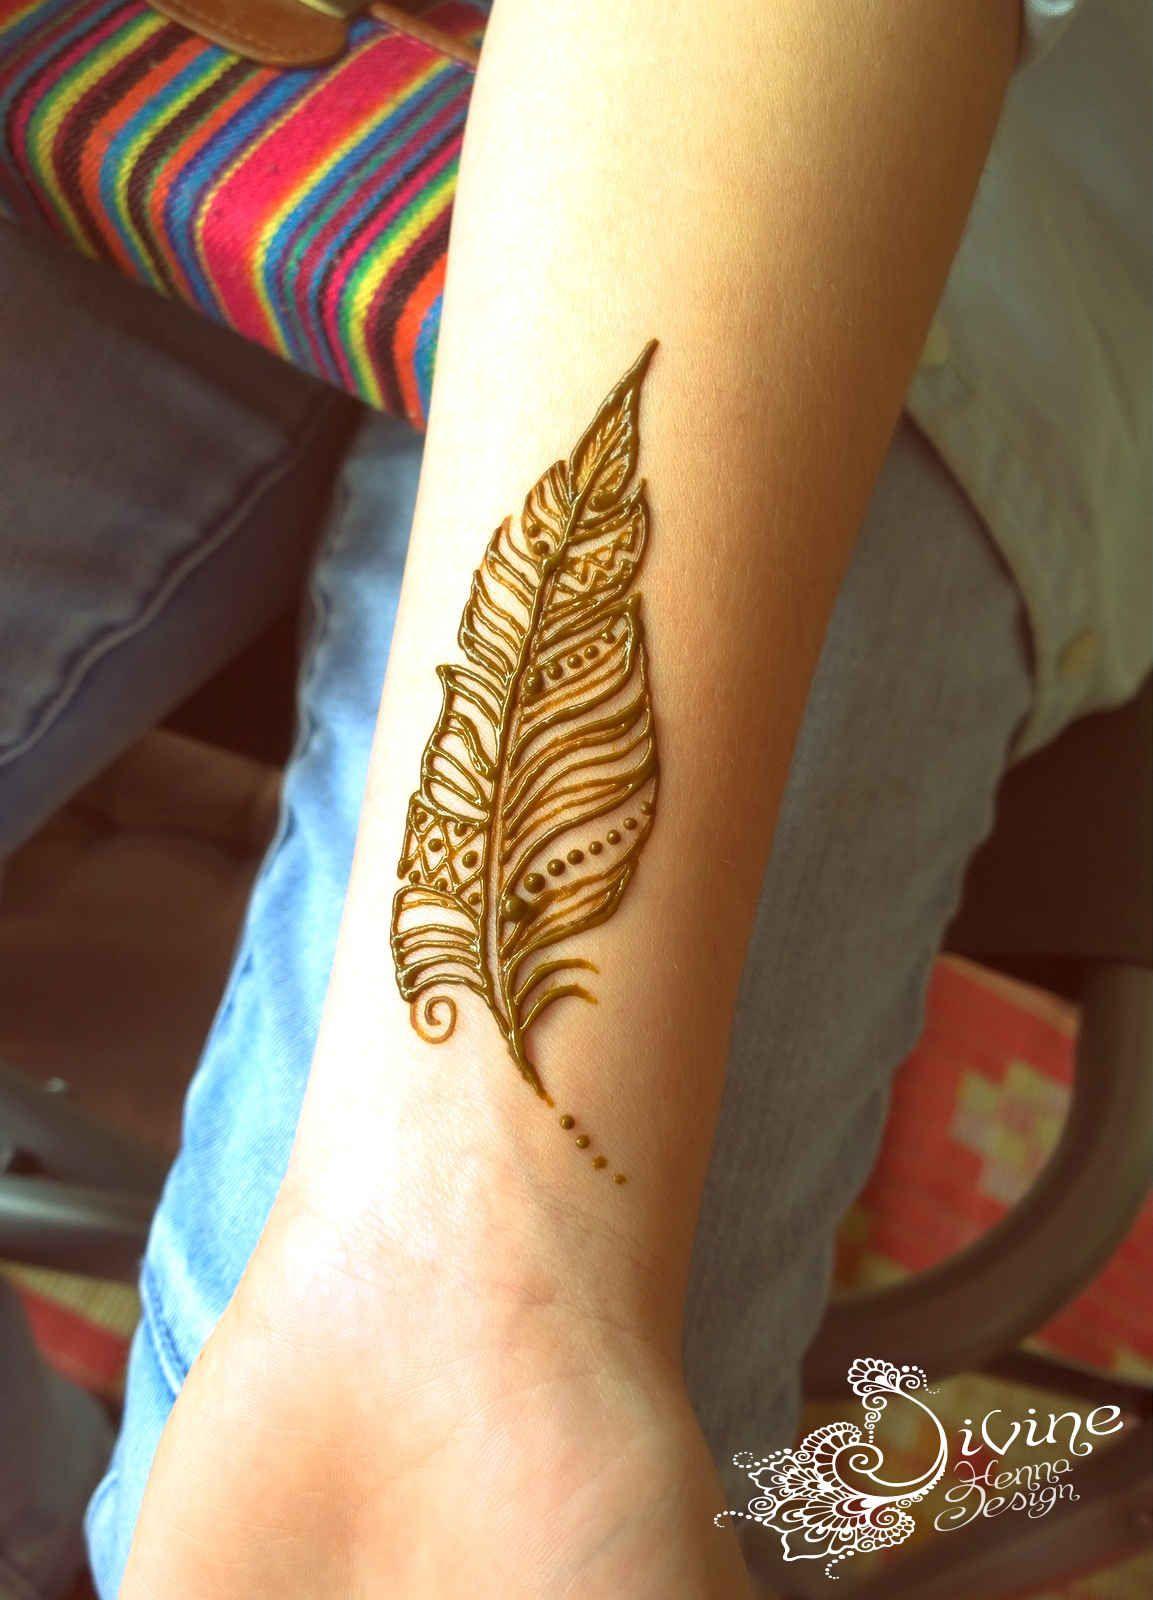 Bird Henna Tattoo: Henna Feather Design - Google Search